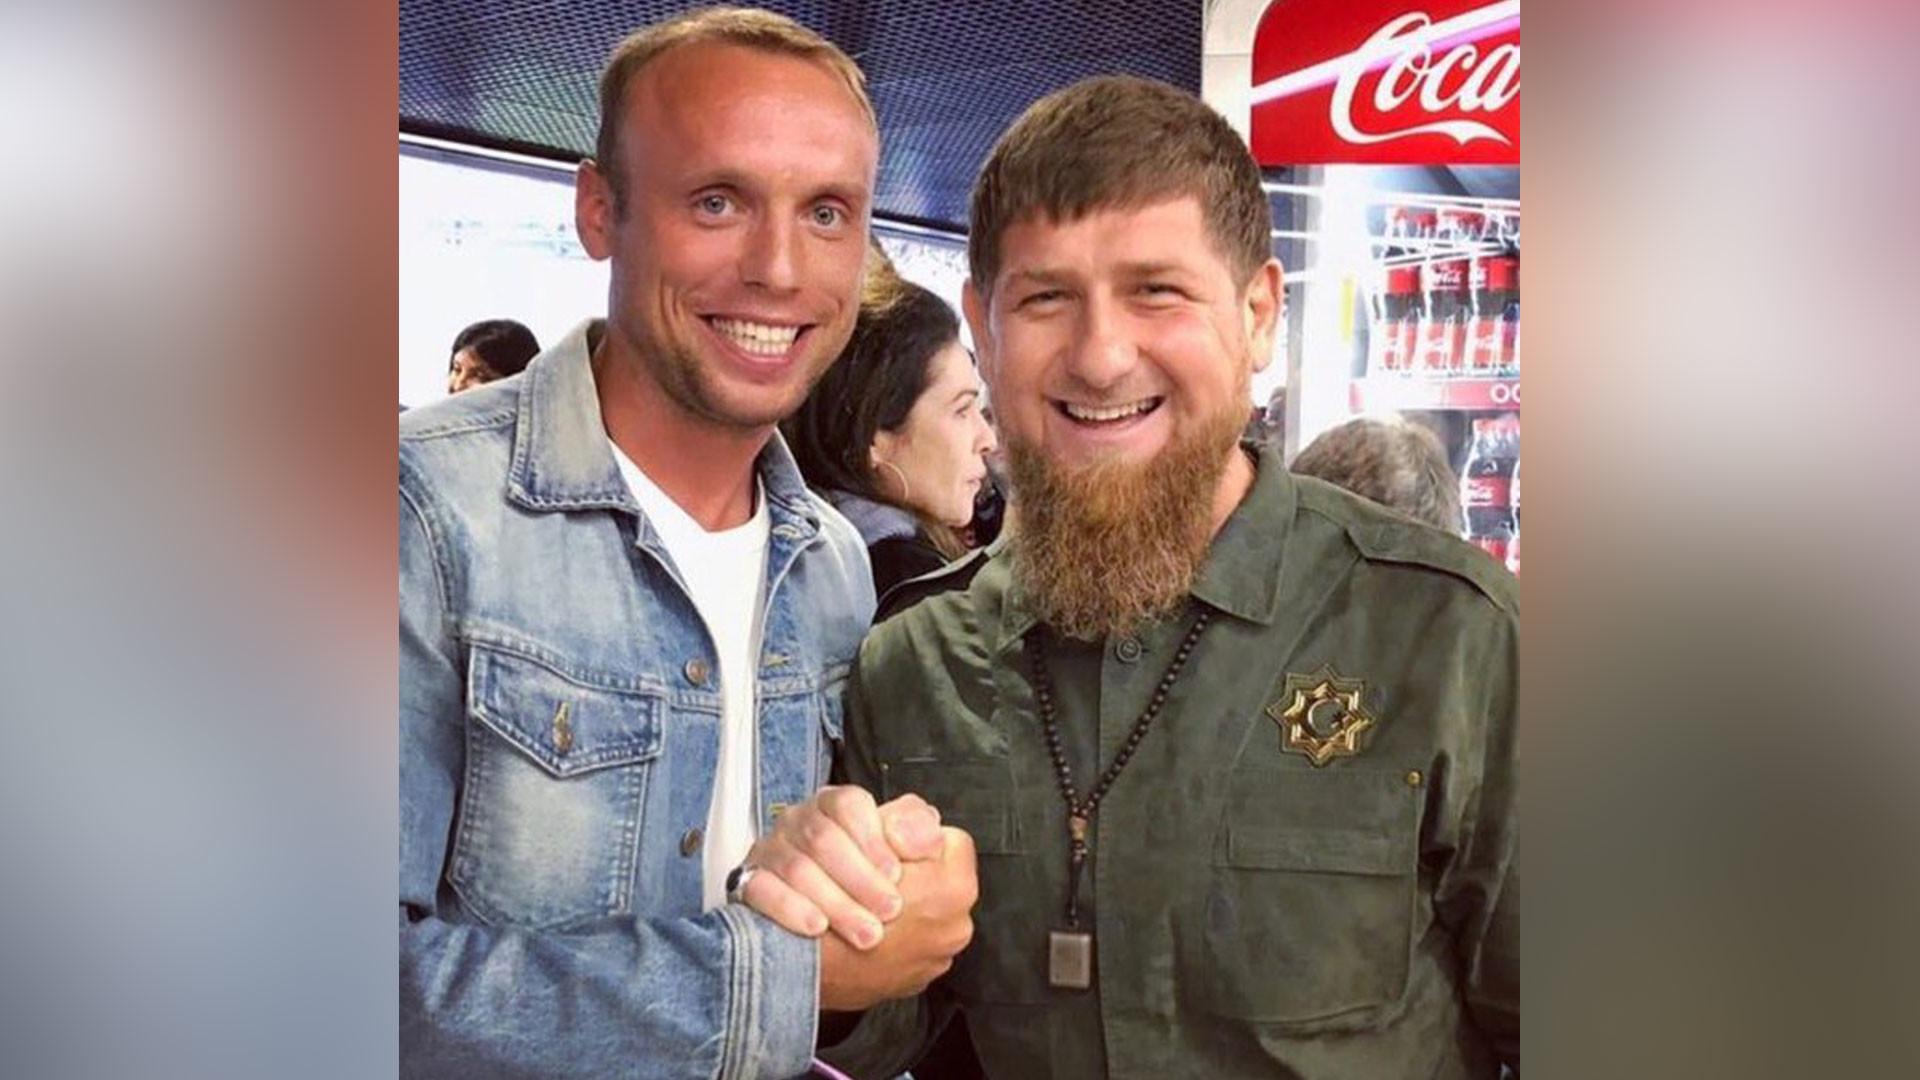 "<p>Денис Глушаков и Рамзан Кадыров. Фото © VK/<a href=""https://vk.com/akhmatgrozny?w=wall-83476010_13480"" target=""_self"">akhmatgrozny</a></p>"